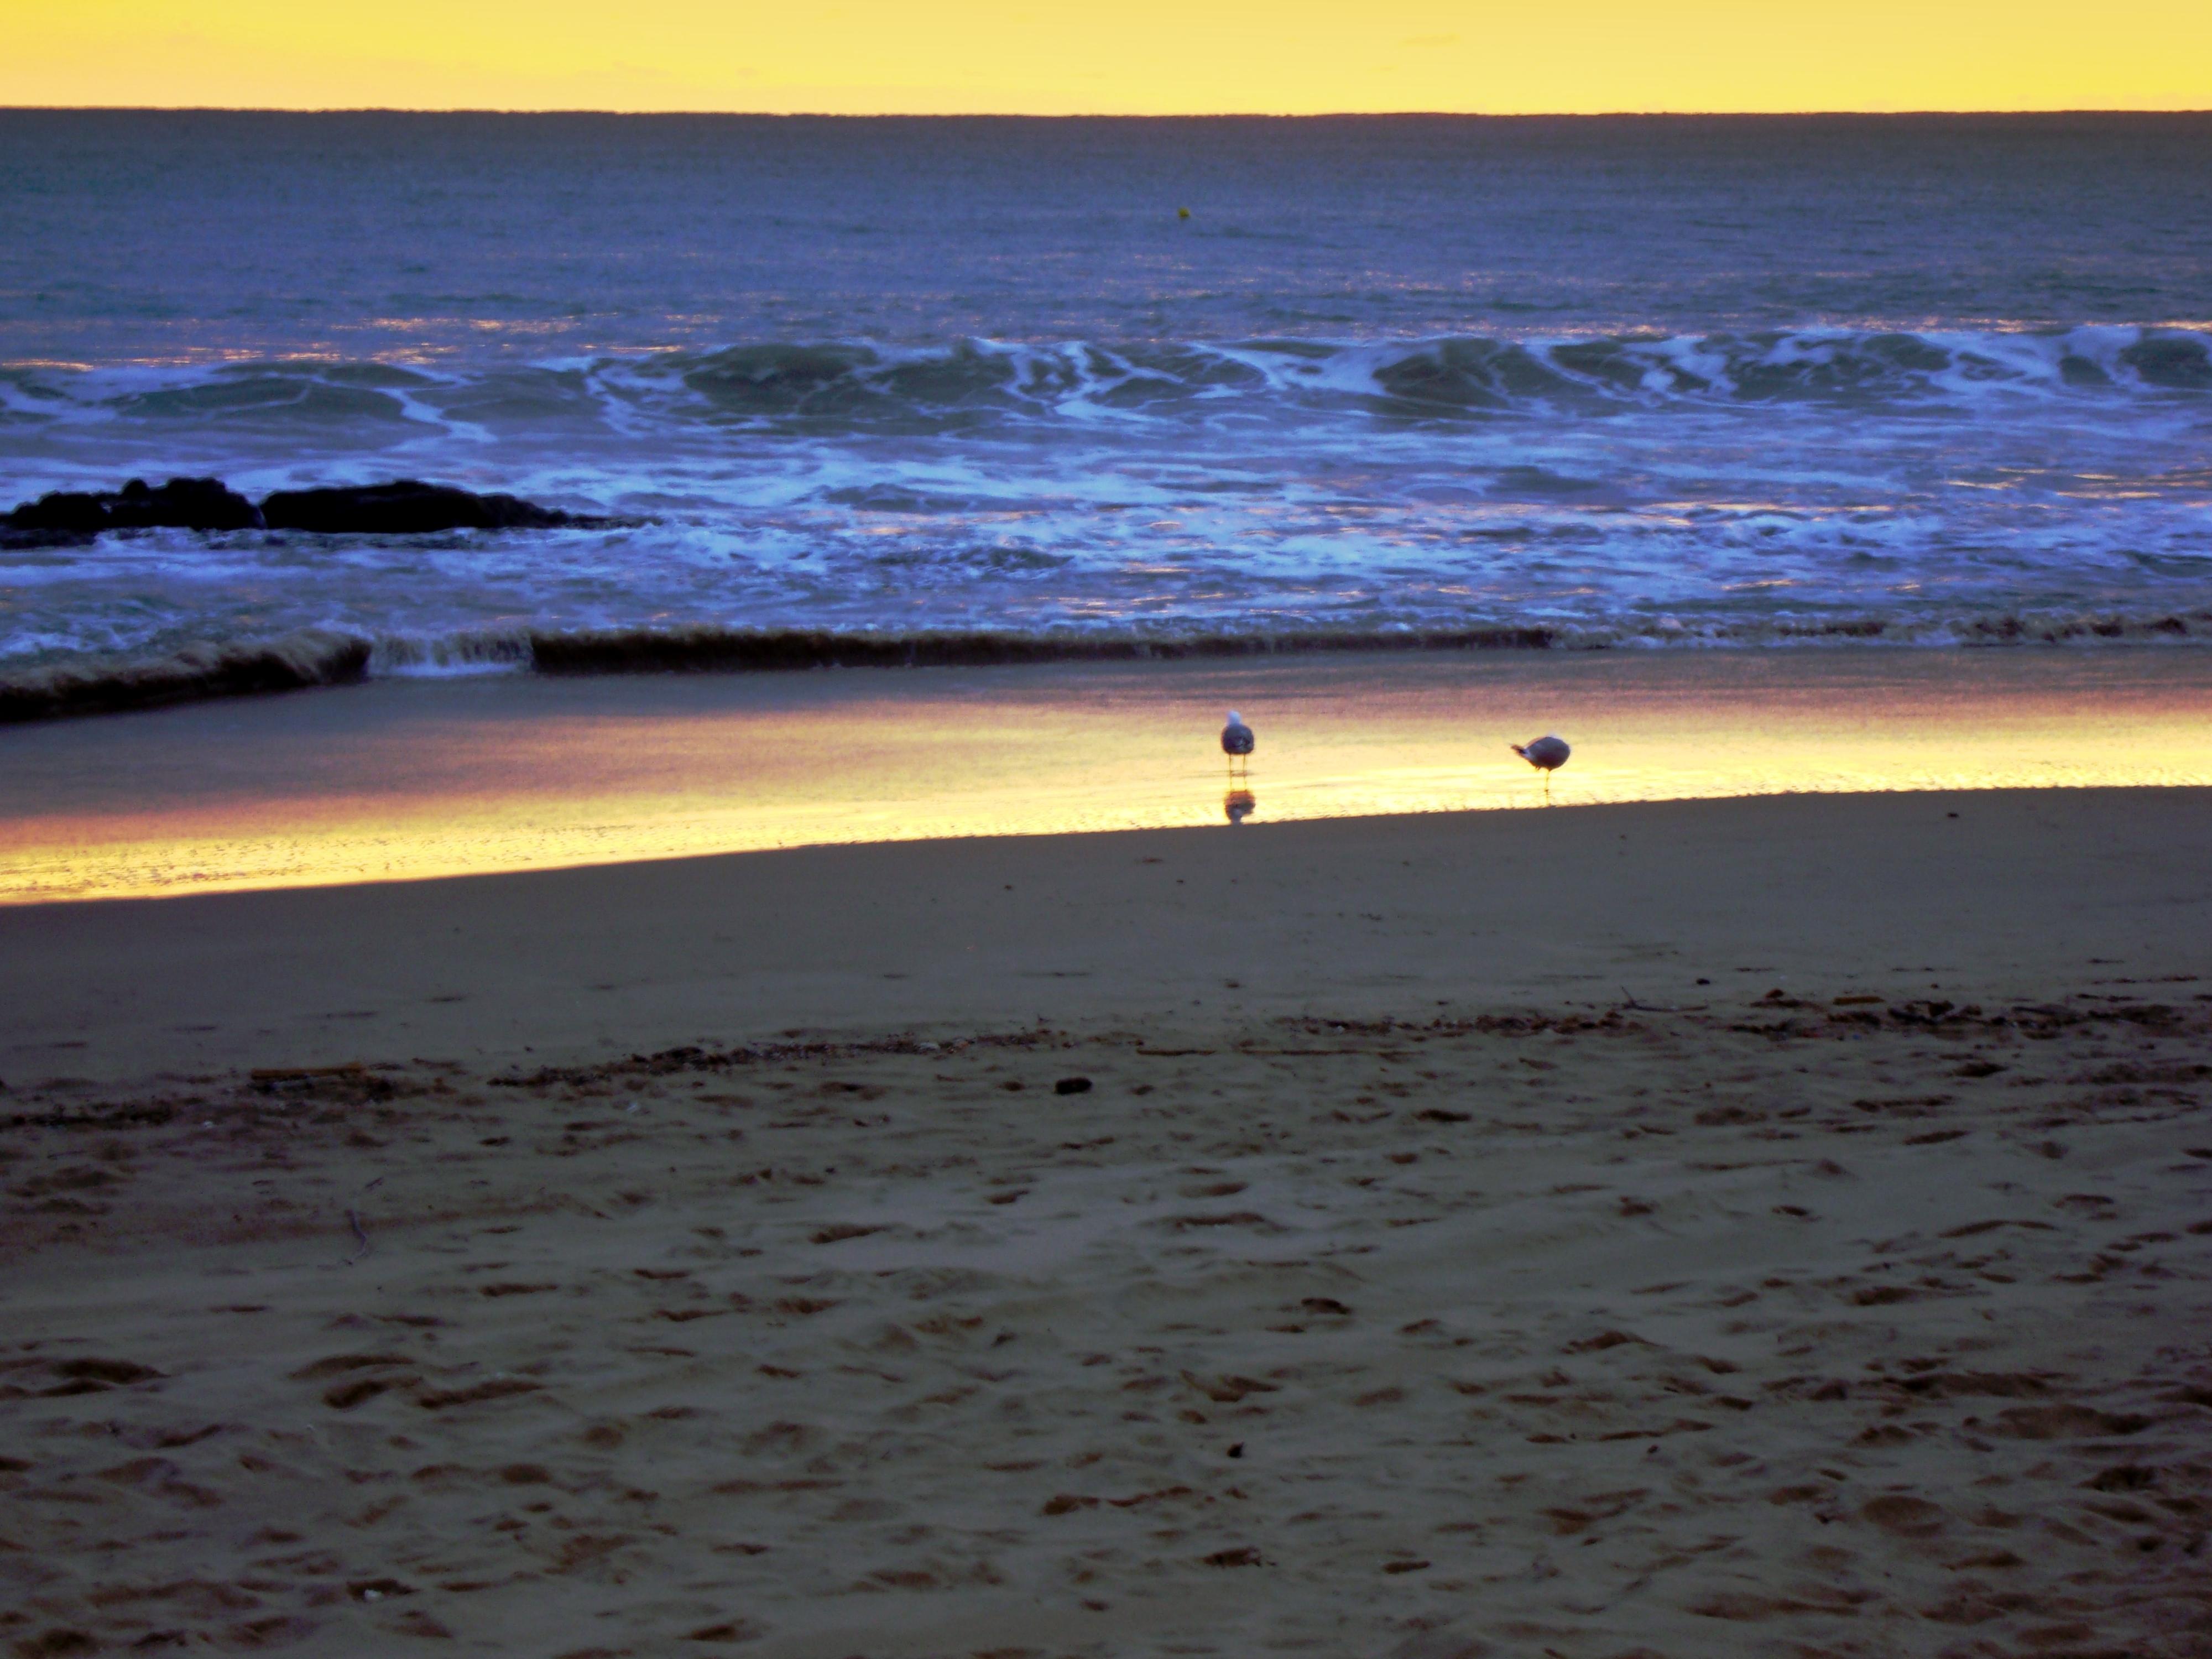 Anochecer En La Playa